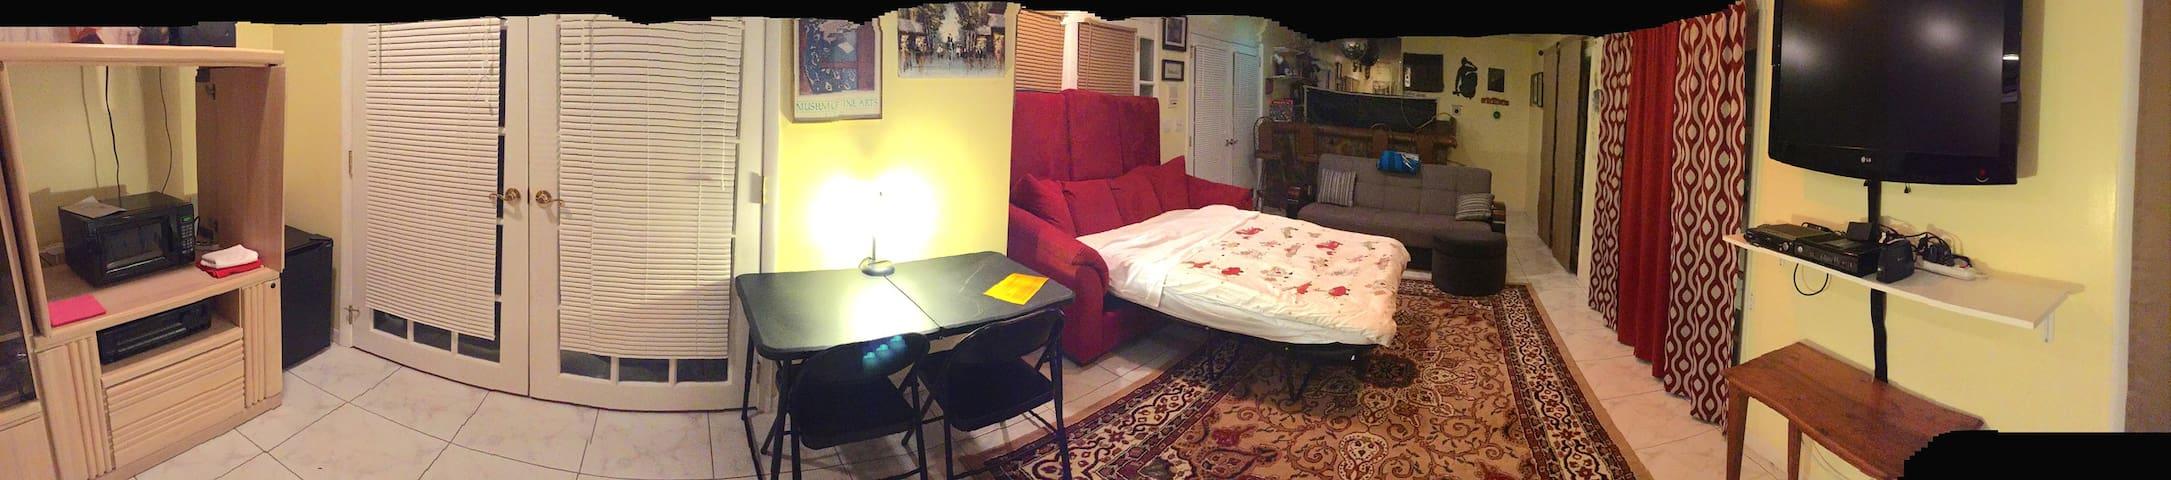 Separate, cozy room & in a home in West Miami. - Miami - Ház